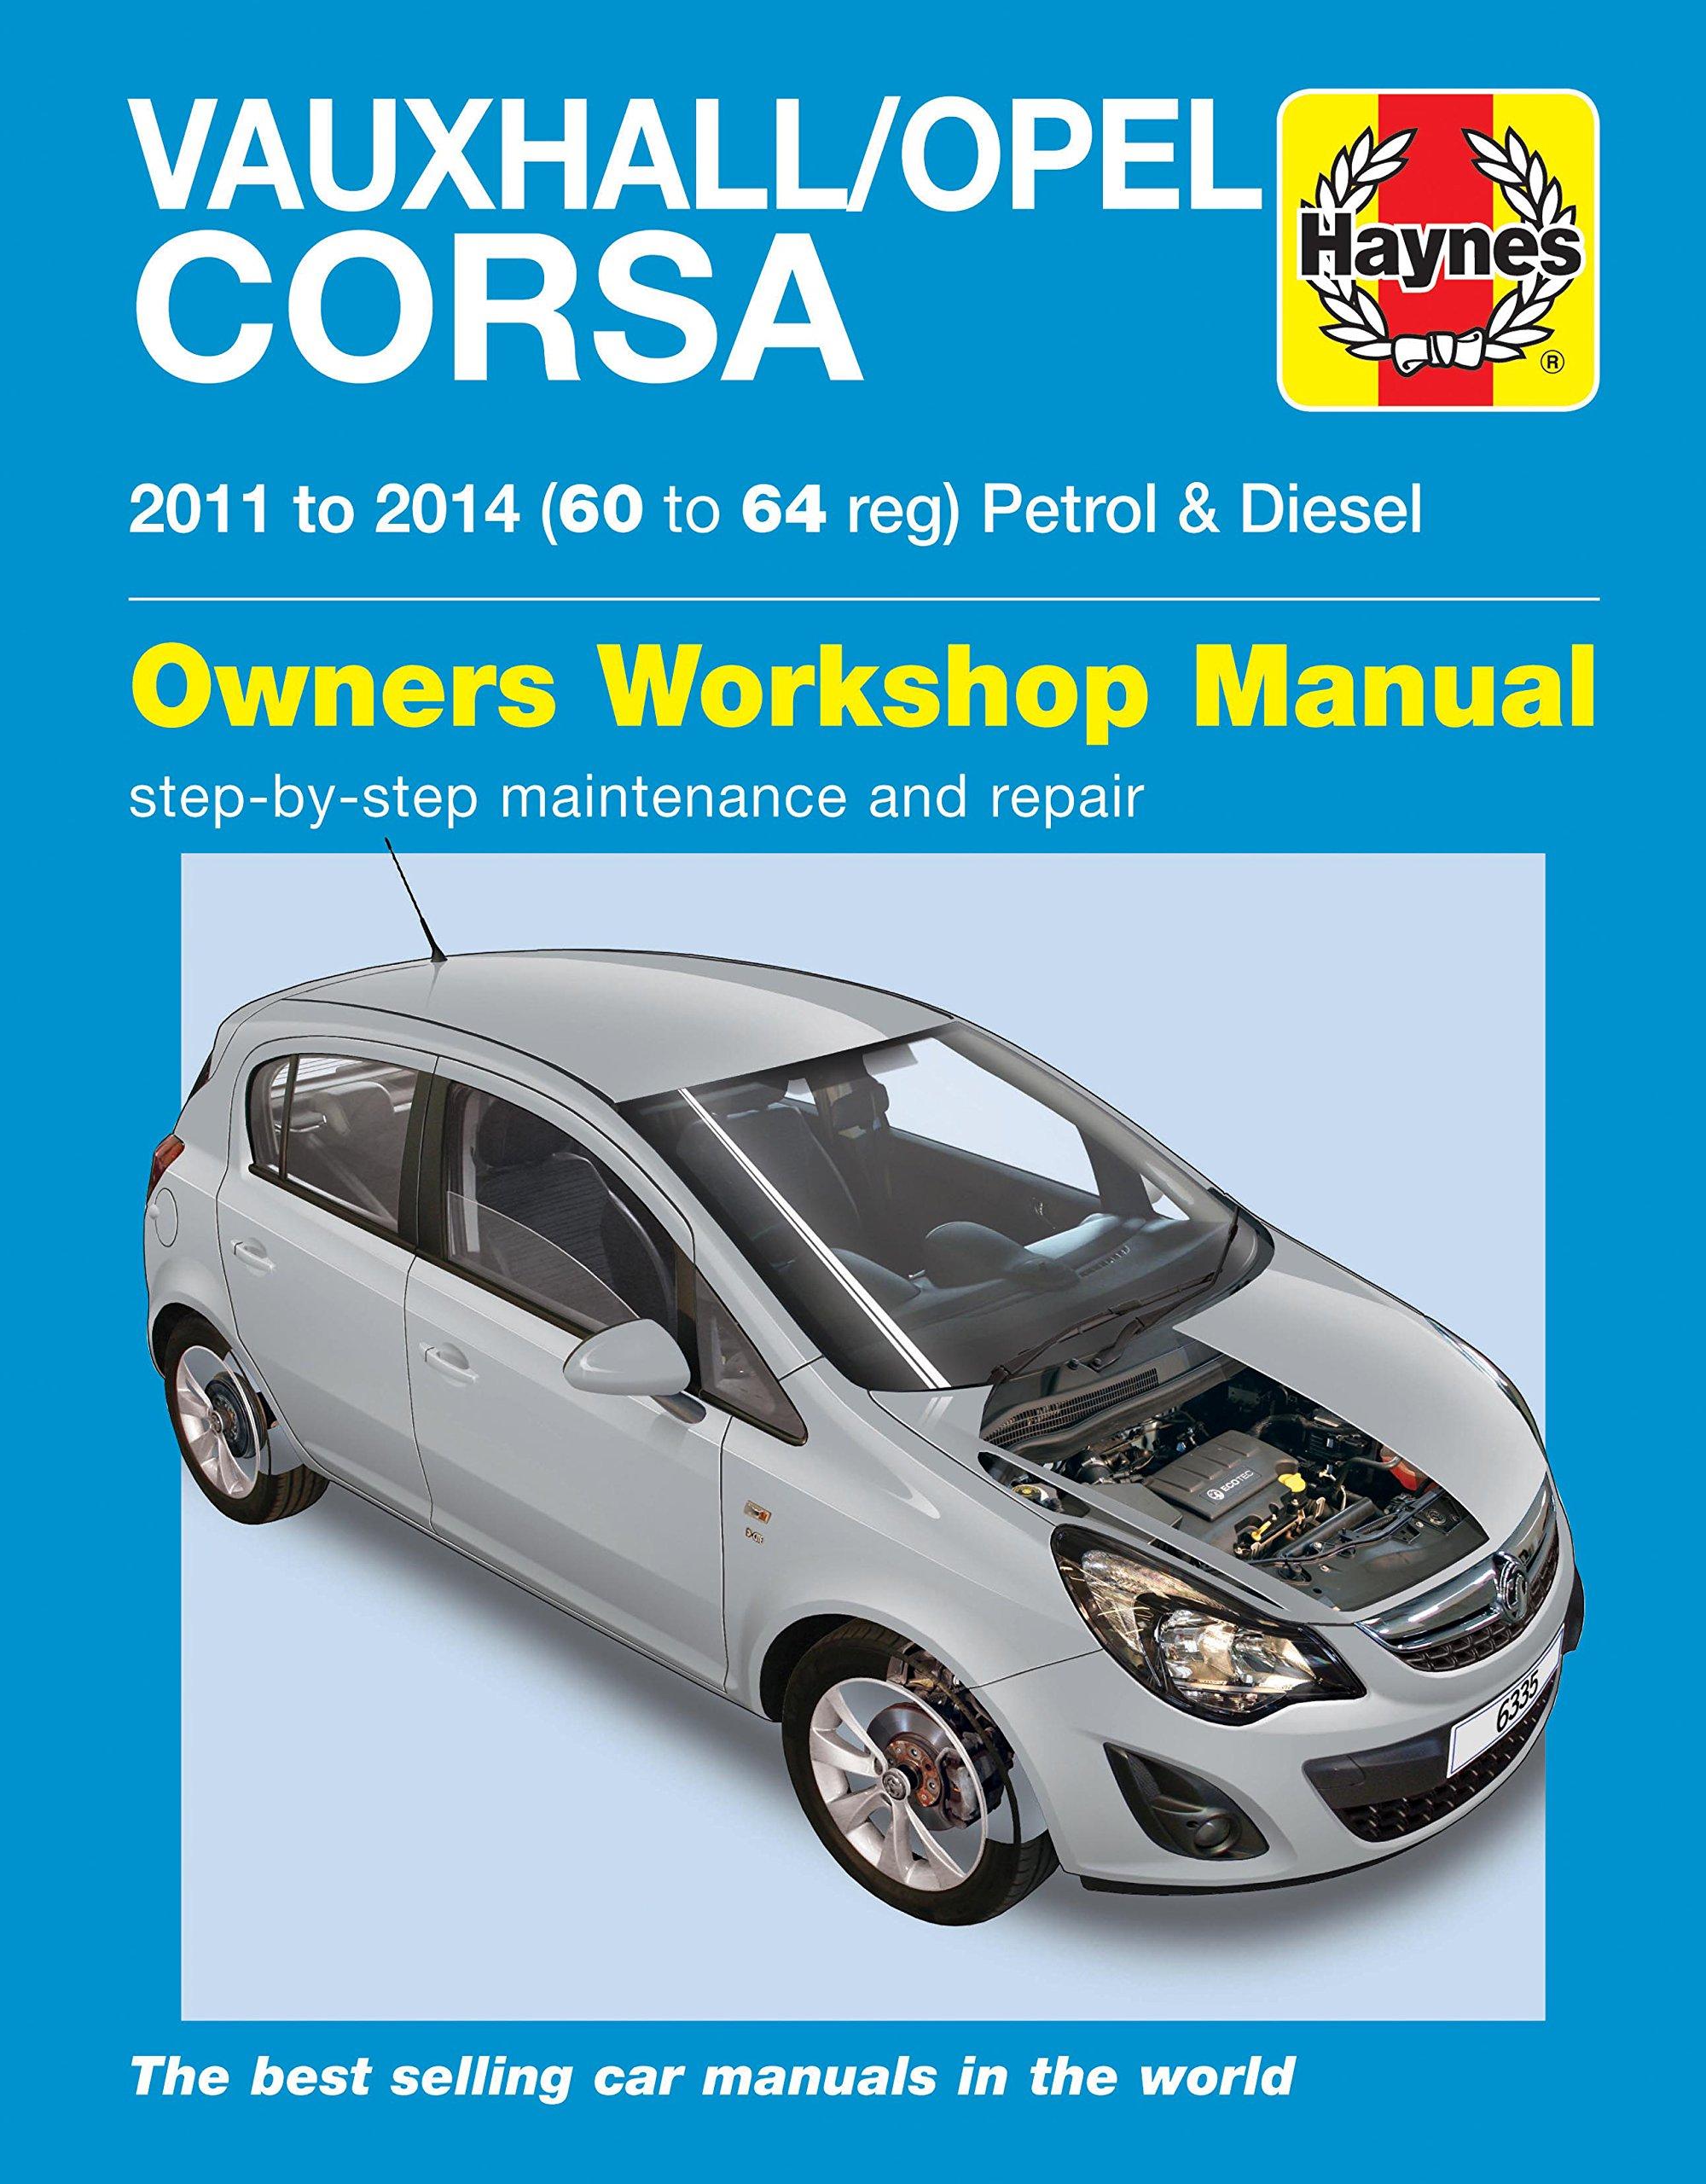 Vauxhall/Opel Corsa Petrol & Diesel 11-14 60 To 64: 2011-2014: Amazon.es: John S. Mead: Libros en idiomas extranjeros